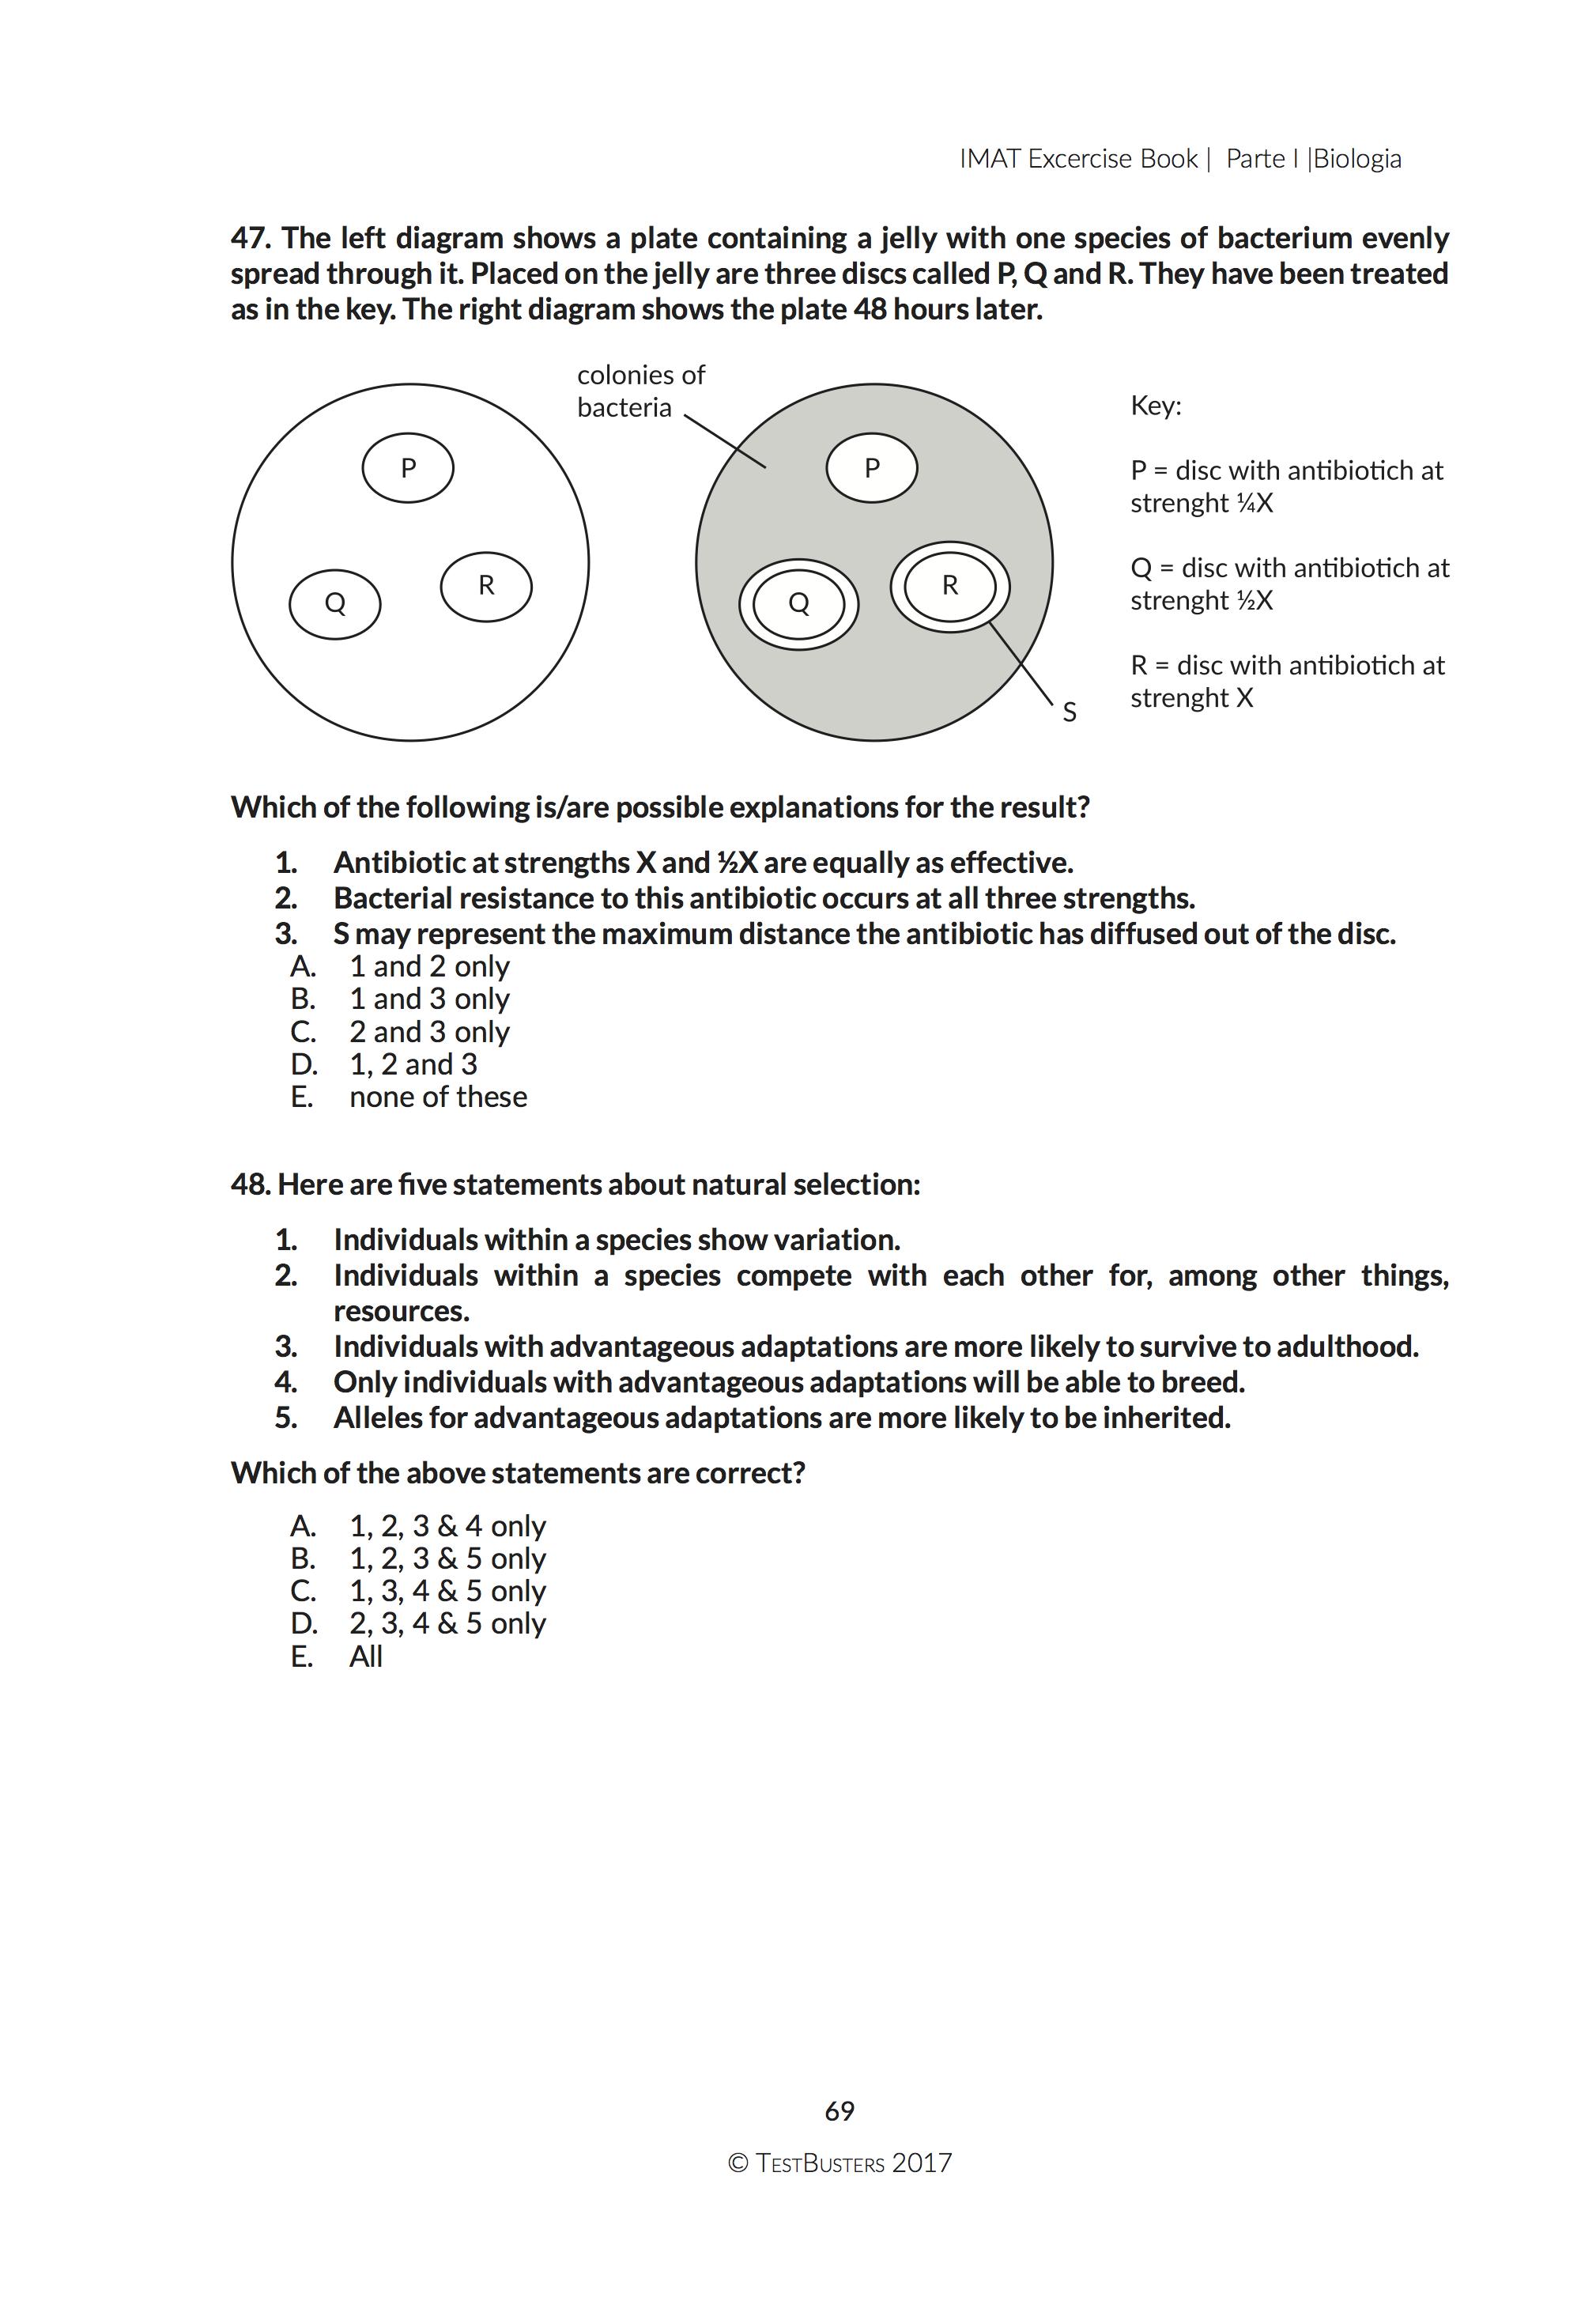 imat-exercise-book-anteprima-pagina-73